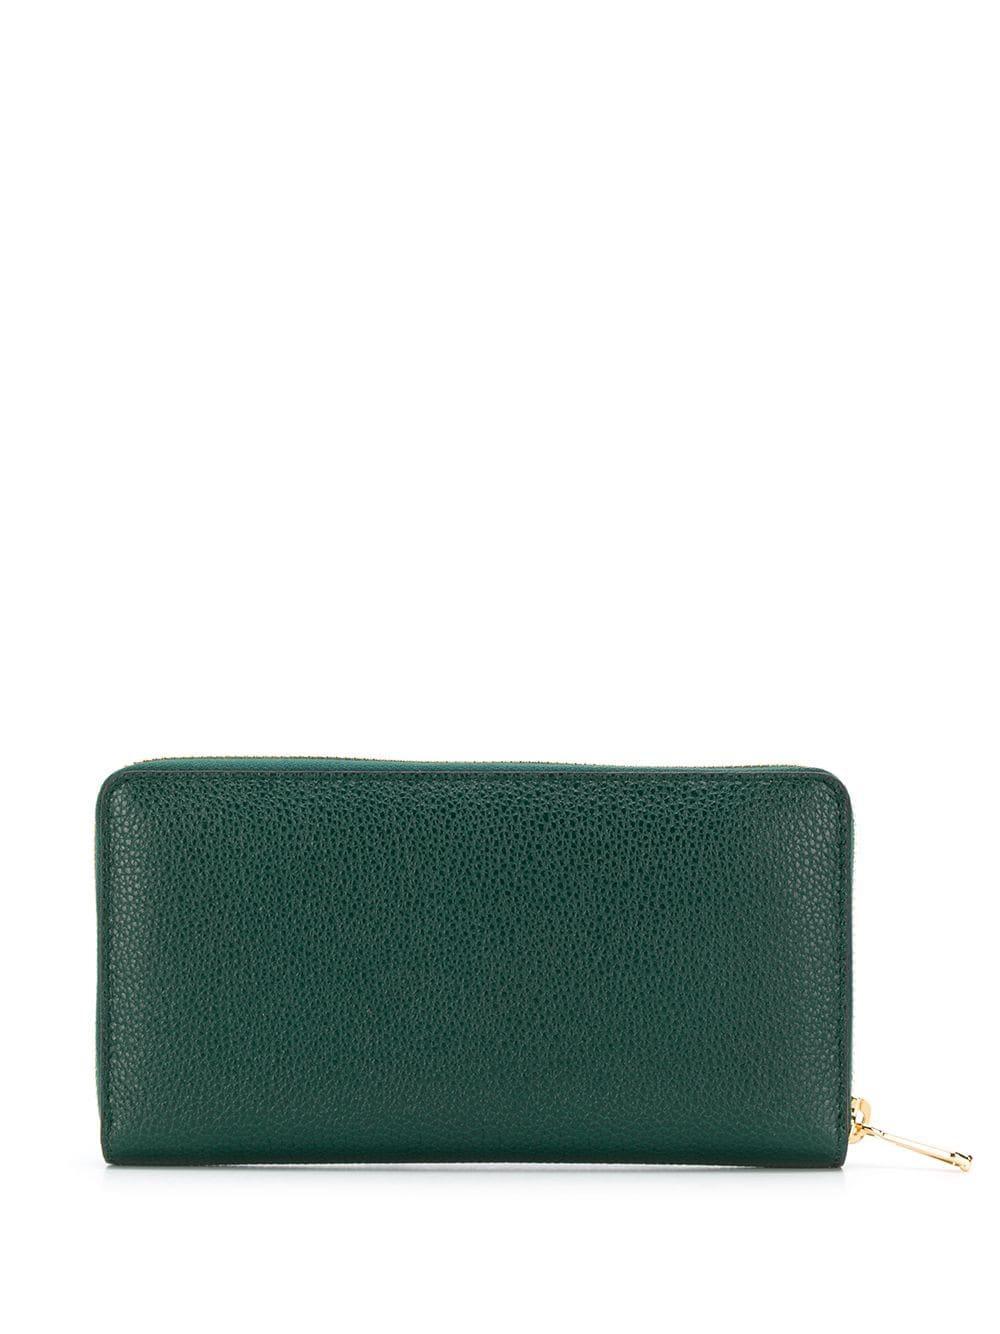 66dd6109ff51 Lyst - Gucci Zumi Continental Wallet in Green